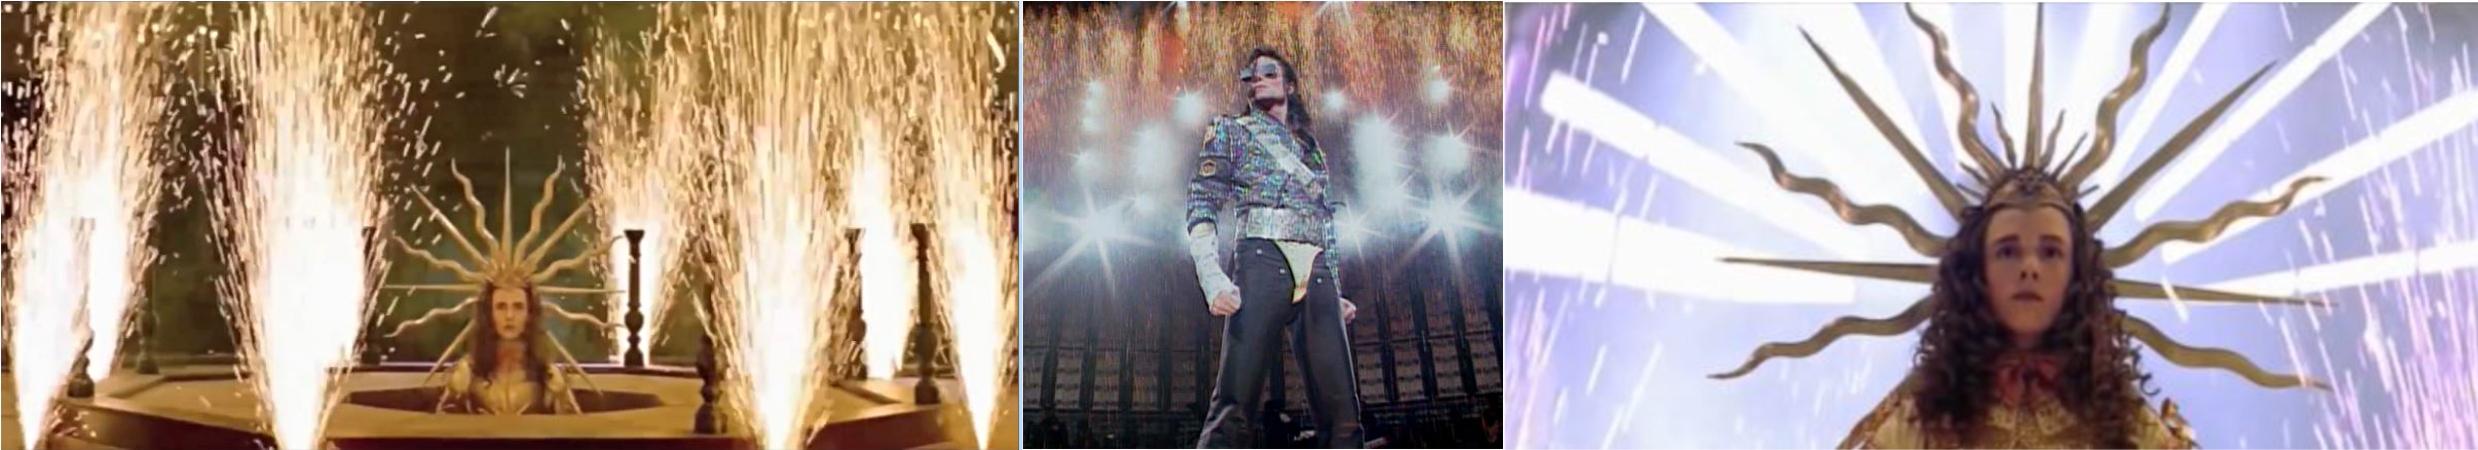 michael jackson dangerous album cover explained meaning erklärt symbols symbole bedeutung ryden art ludwig ivx sonnenkönig frankreich france gold sun jam live firework king